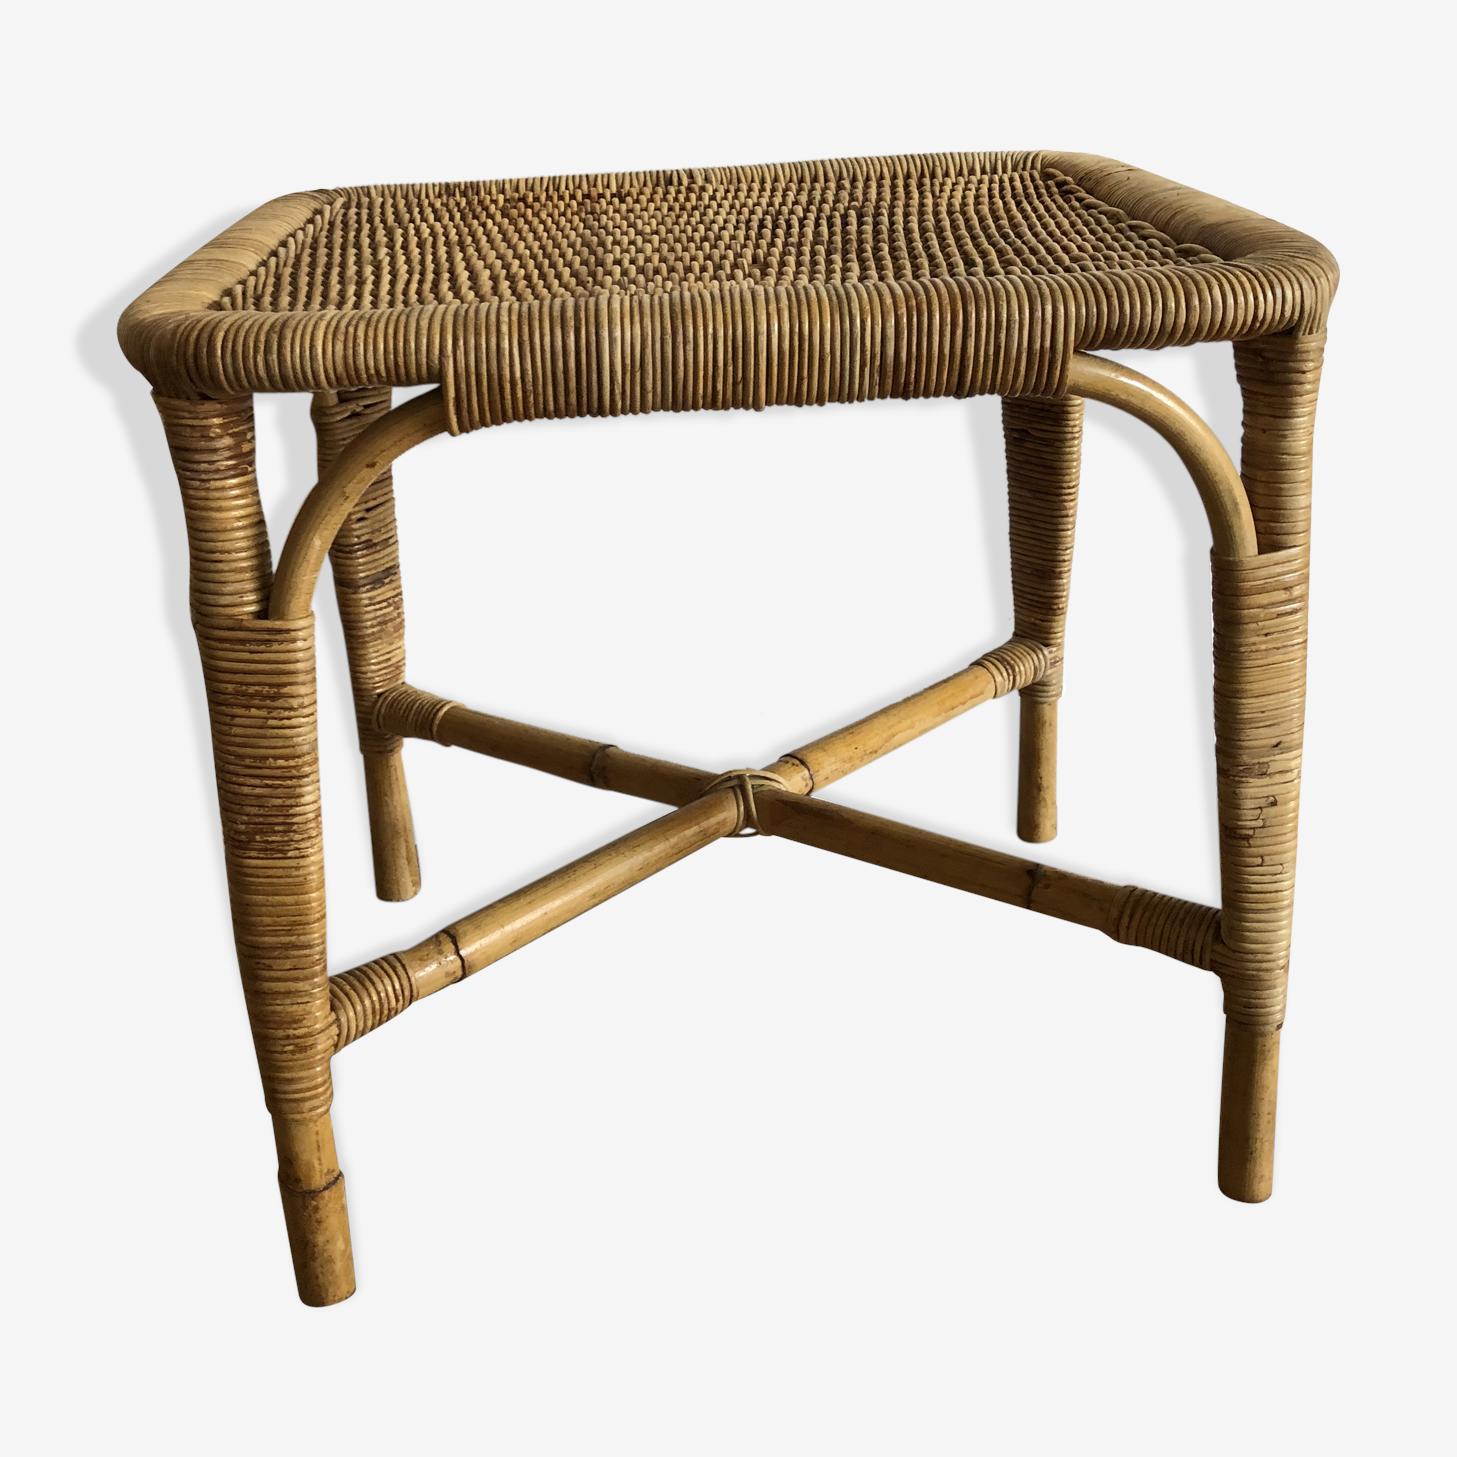 Table basse en rotin vintage année 50/60